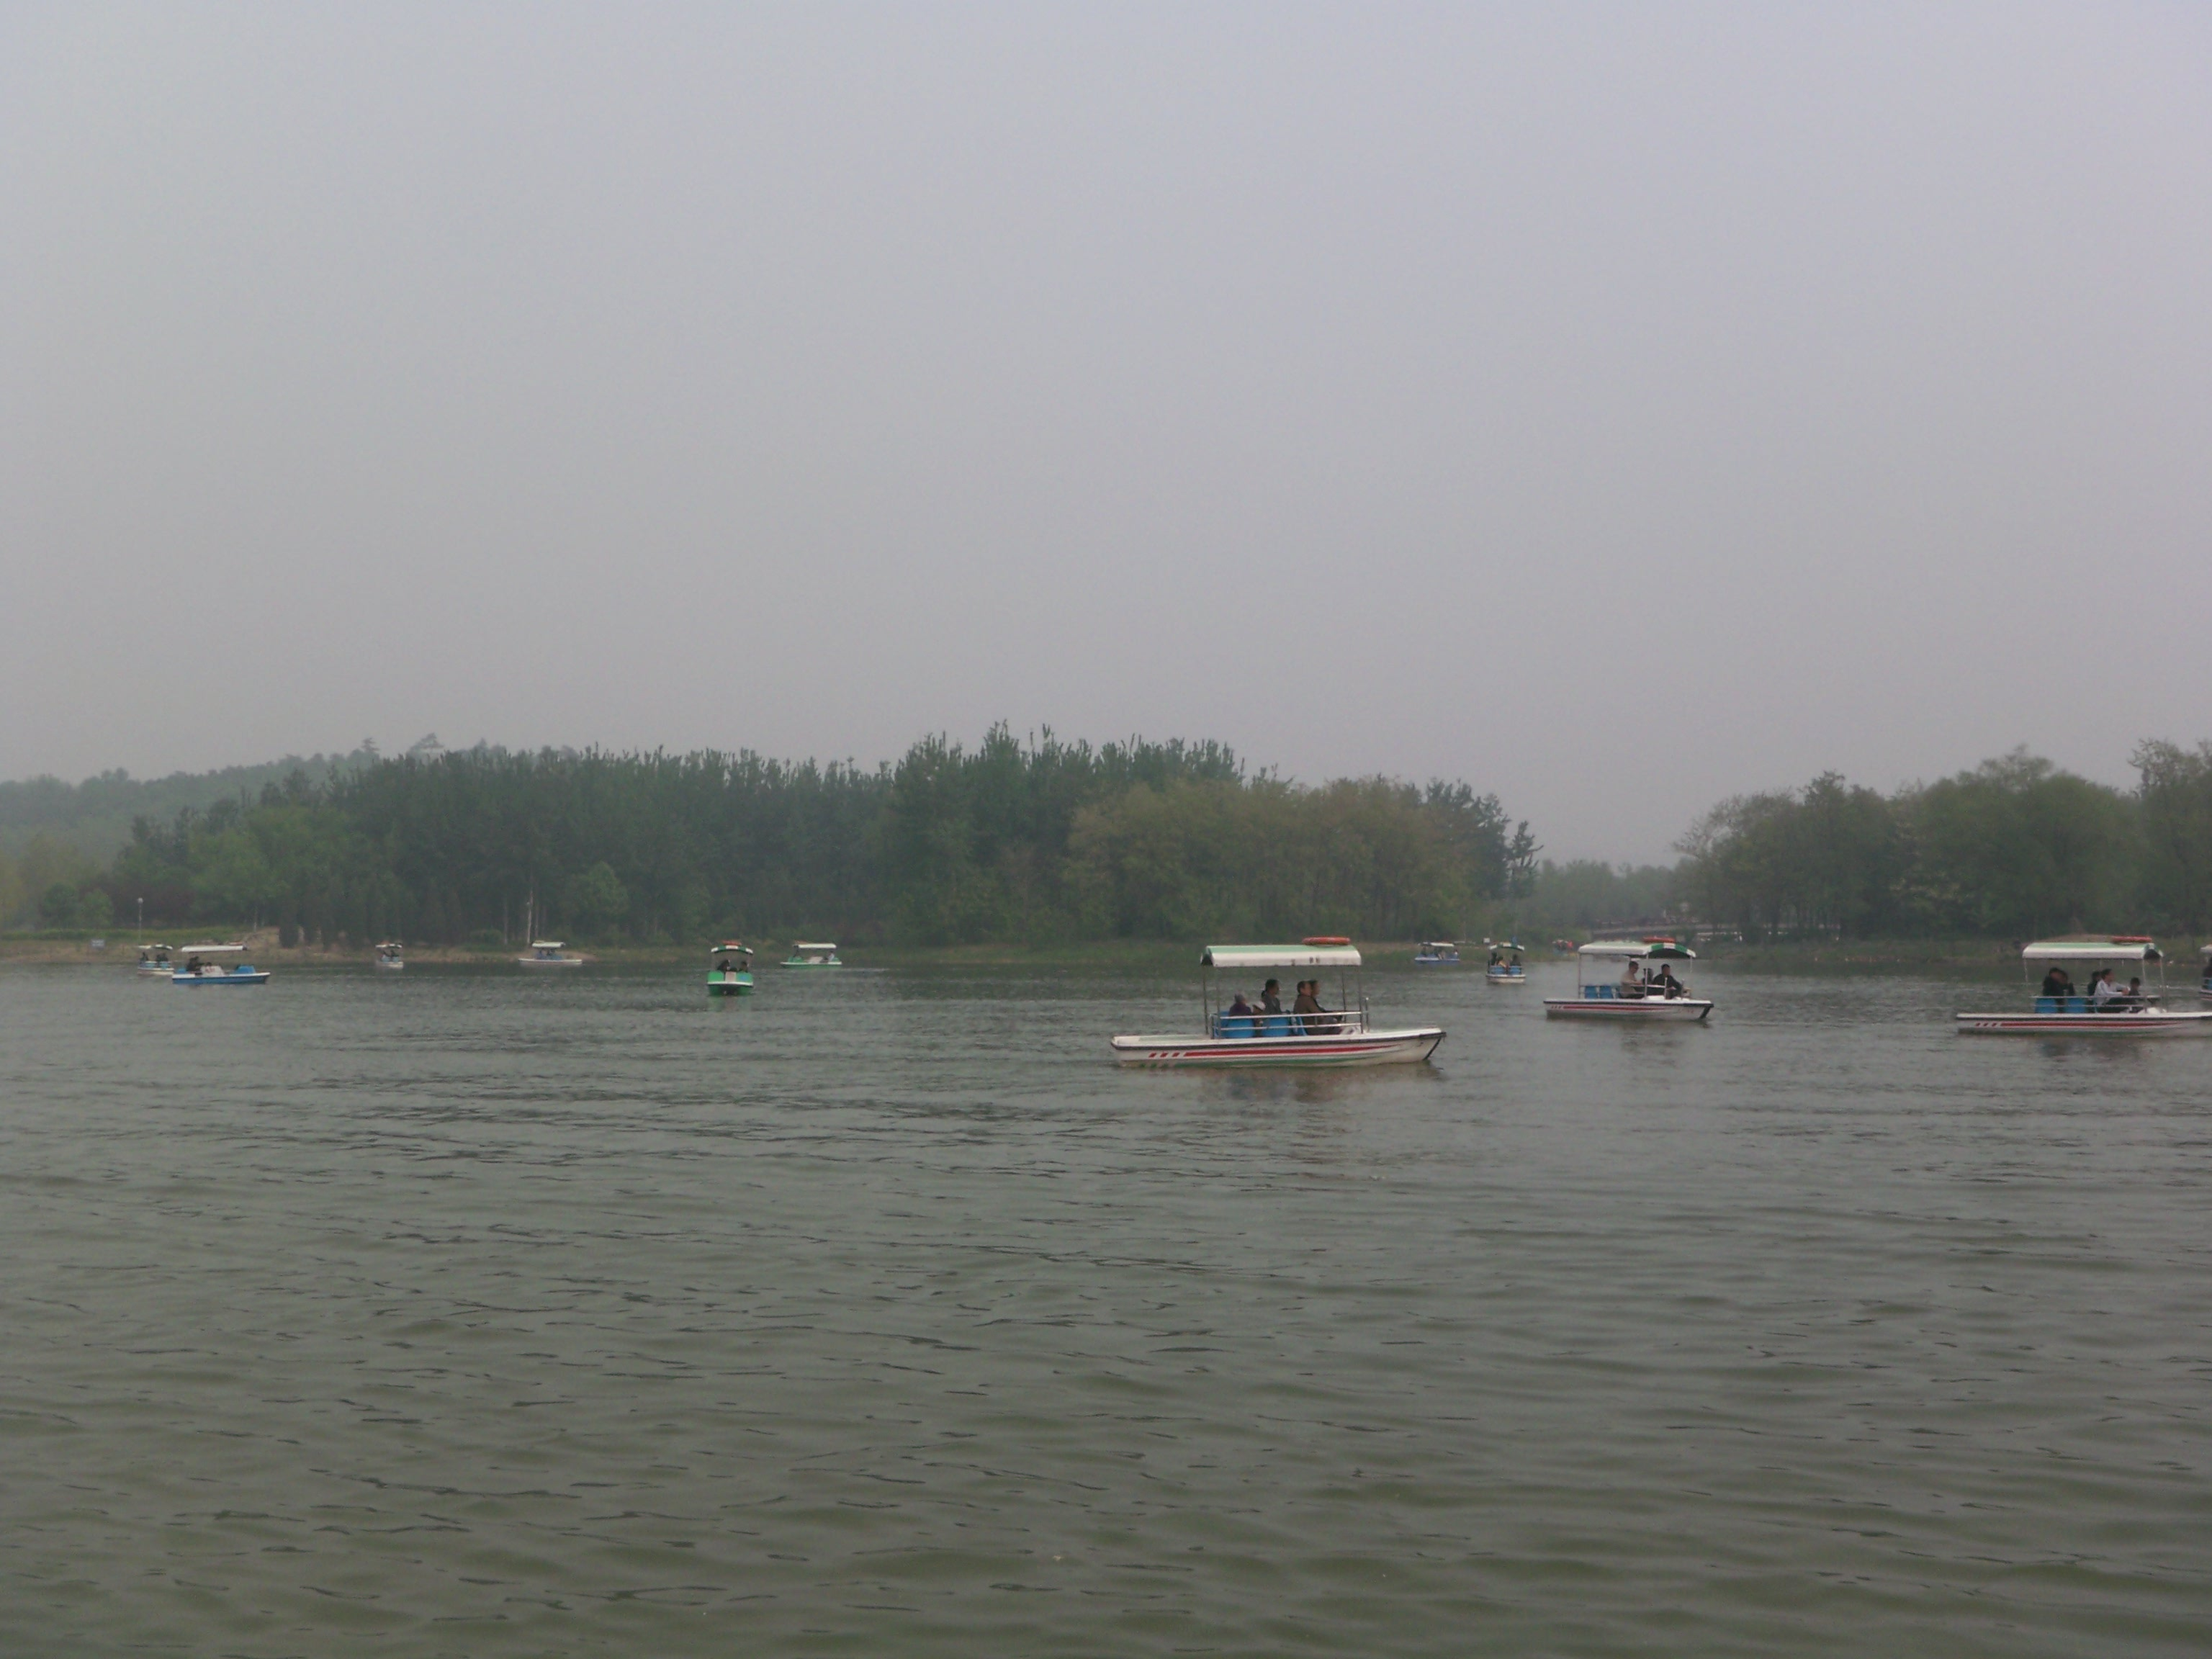 ps 素材风景灰色水面